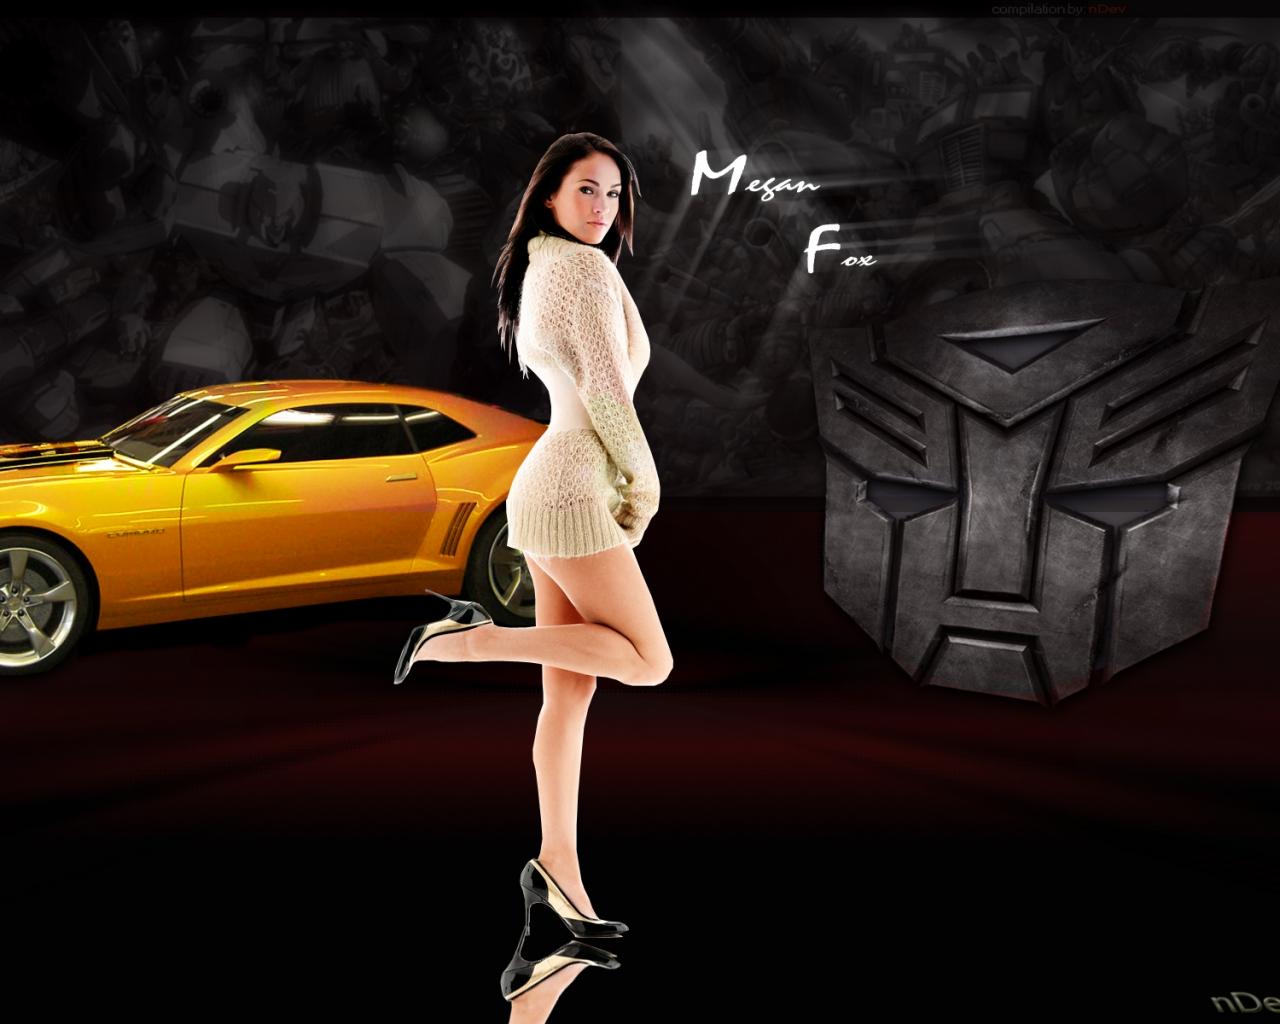 Megan Fox y transformers hd 1280x1024   Famosos   wallpapers hd 38 1280x1024